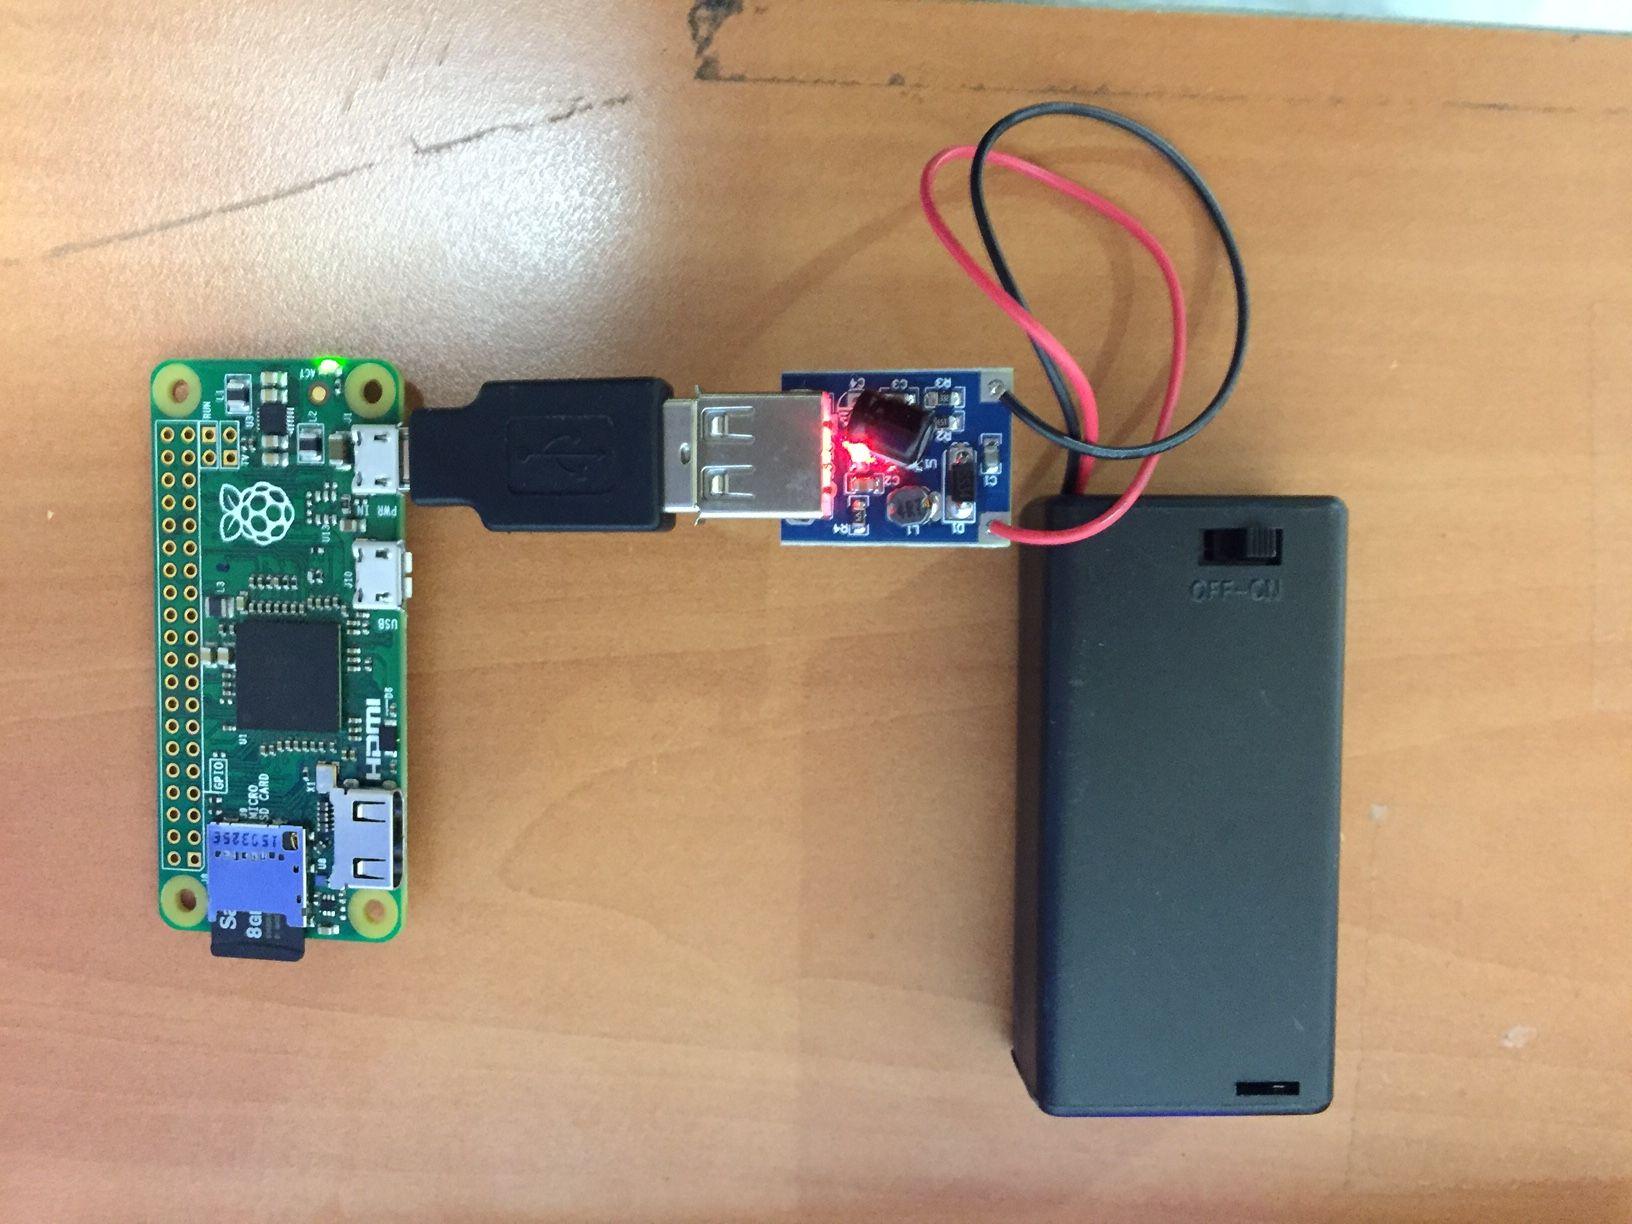 Modmypi Running A Raspberry Pi Zero From An Aa Battery Pack